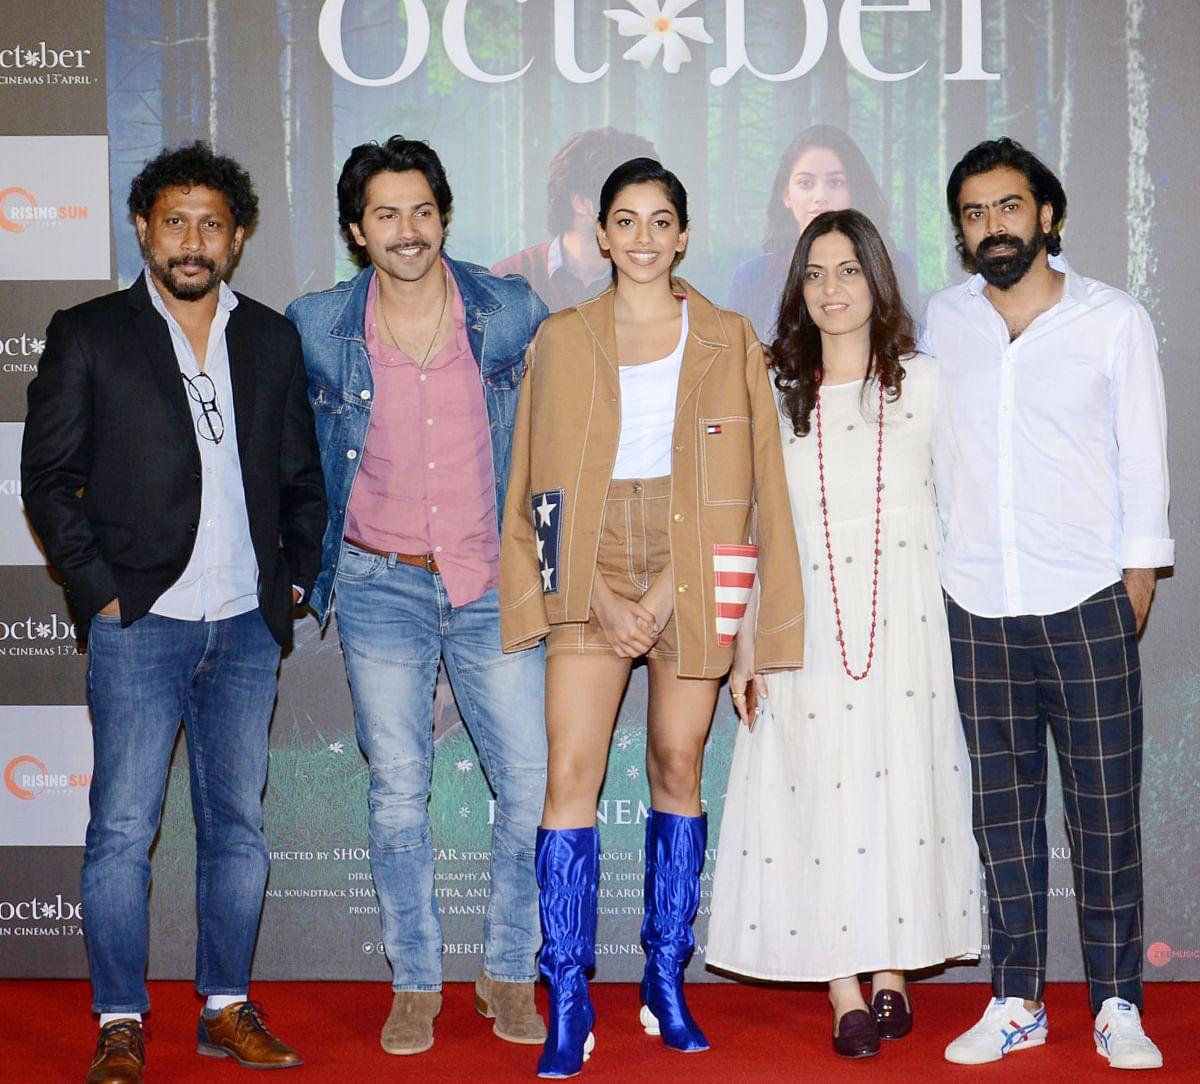 Shoojit Sircar, Varun Dhawan, Banita Sandhu, Juhi Chaturvedi and Ronnie Lahiri at the launch of the <i>October </i>trailer.